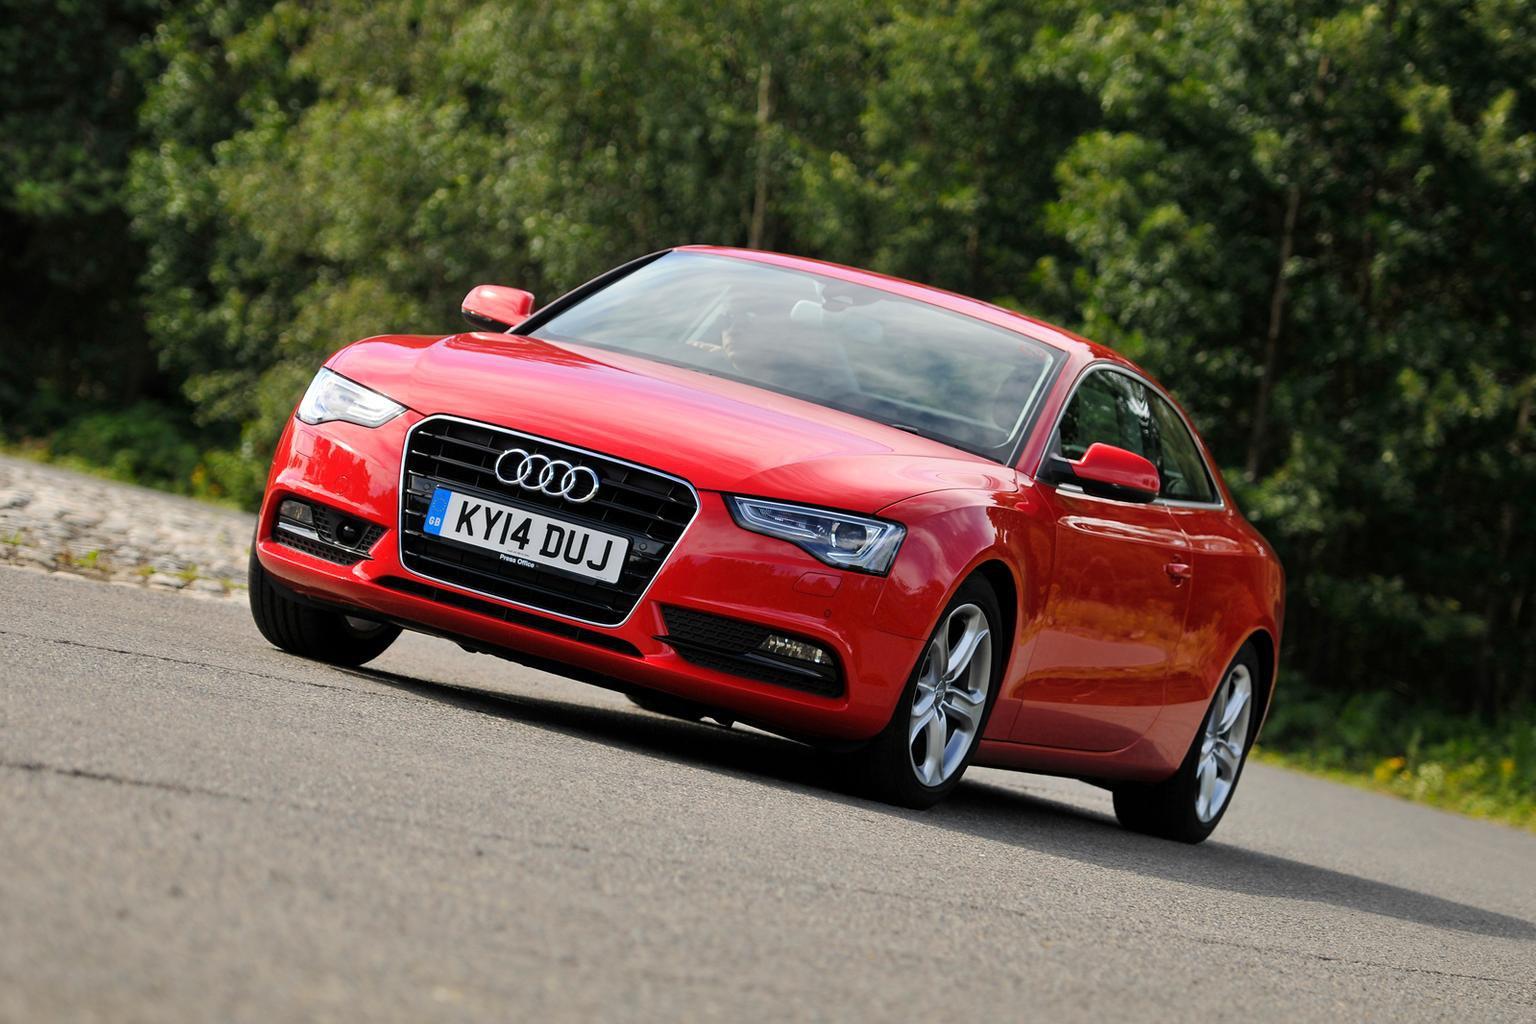 2014 Audi A5 2.0 TDI Ultra review